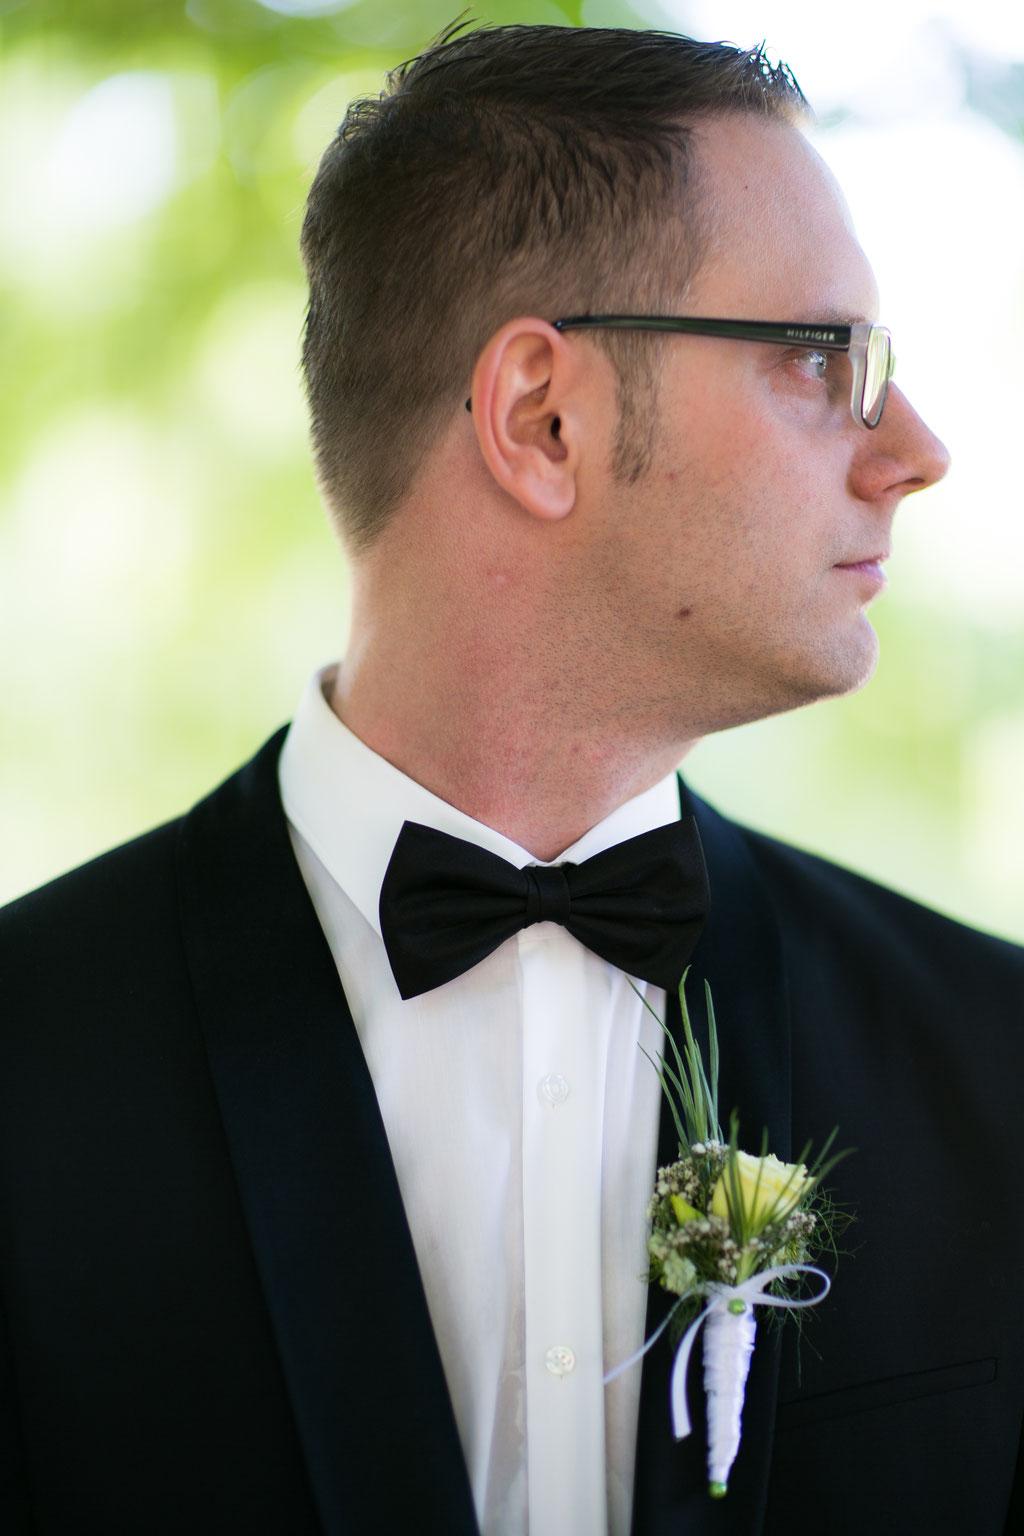 Bräutigam schaut nach rechts im Styleshooting